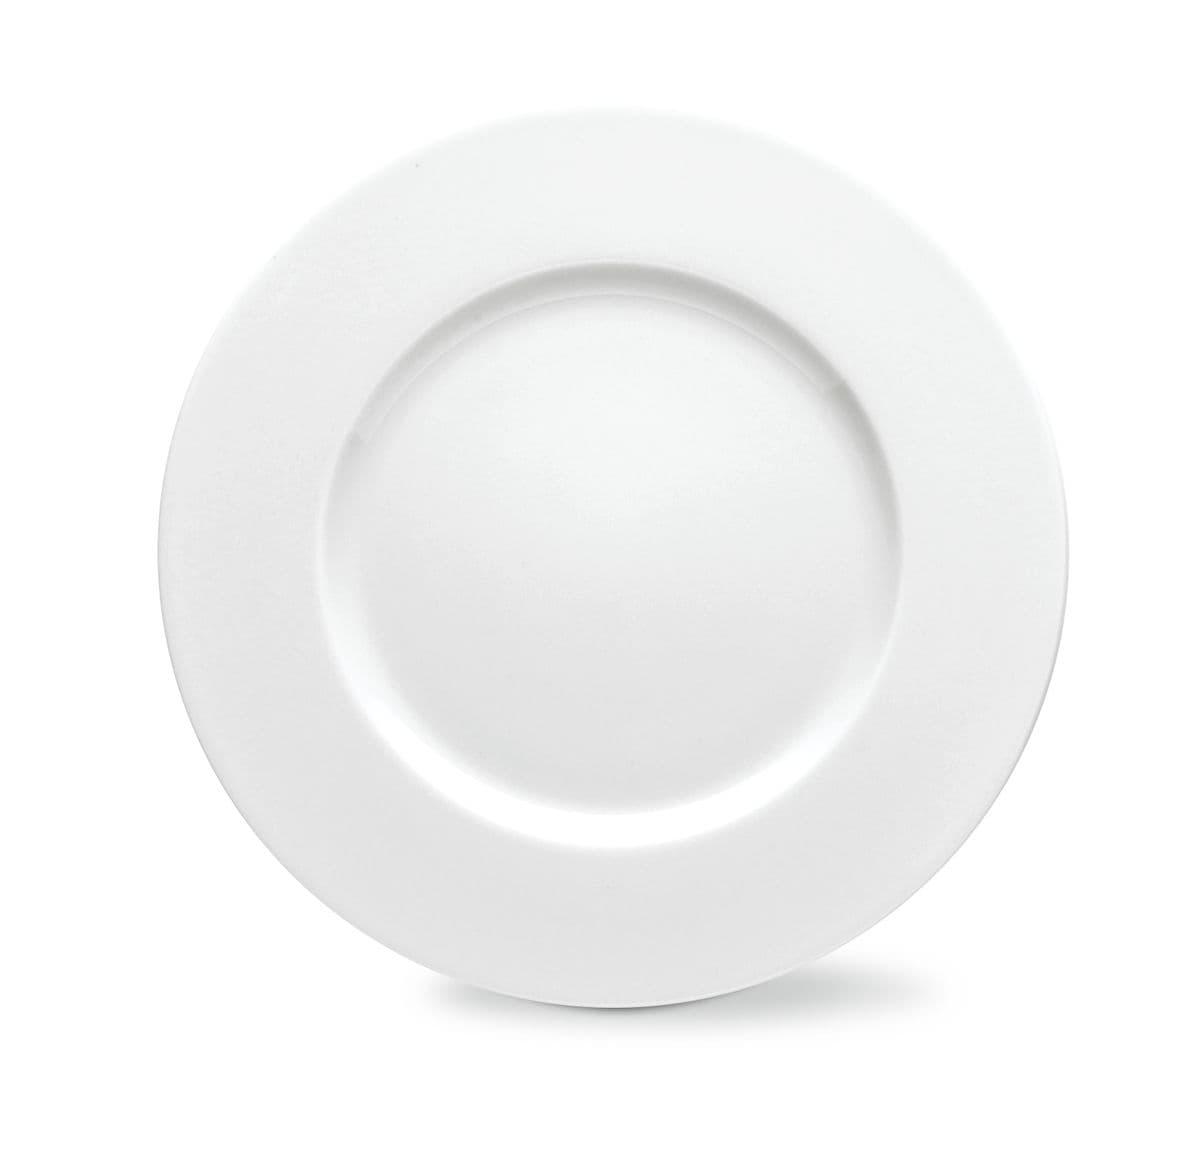 Cucina & Tavola CLASSIC Dessertteller